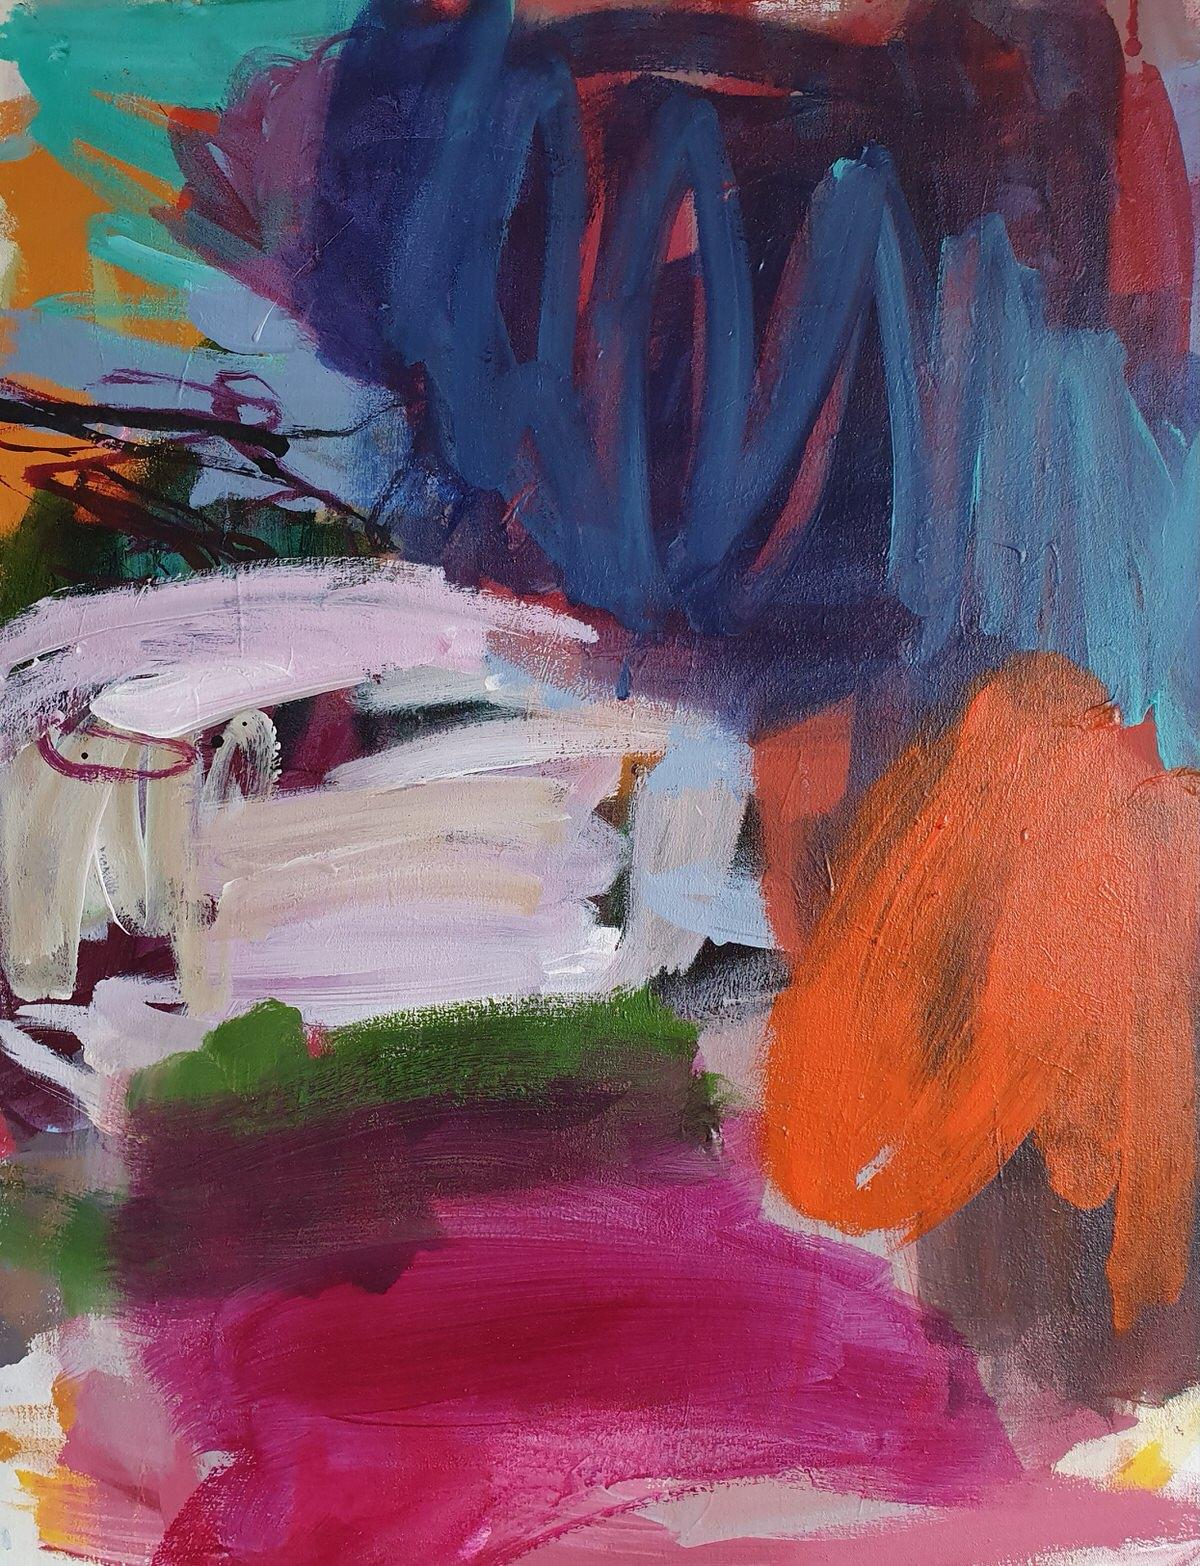 Acryl Mixmedia on Canvas (60x67cm)